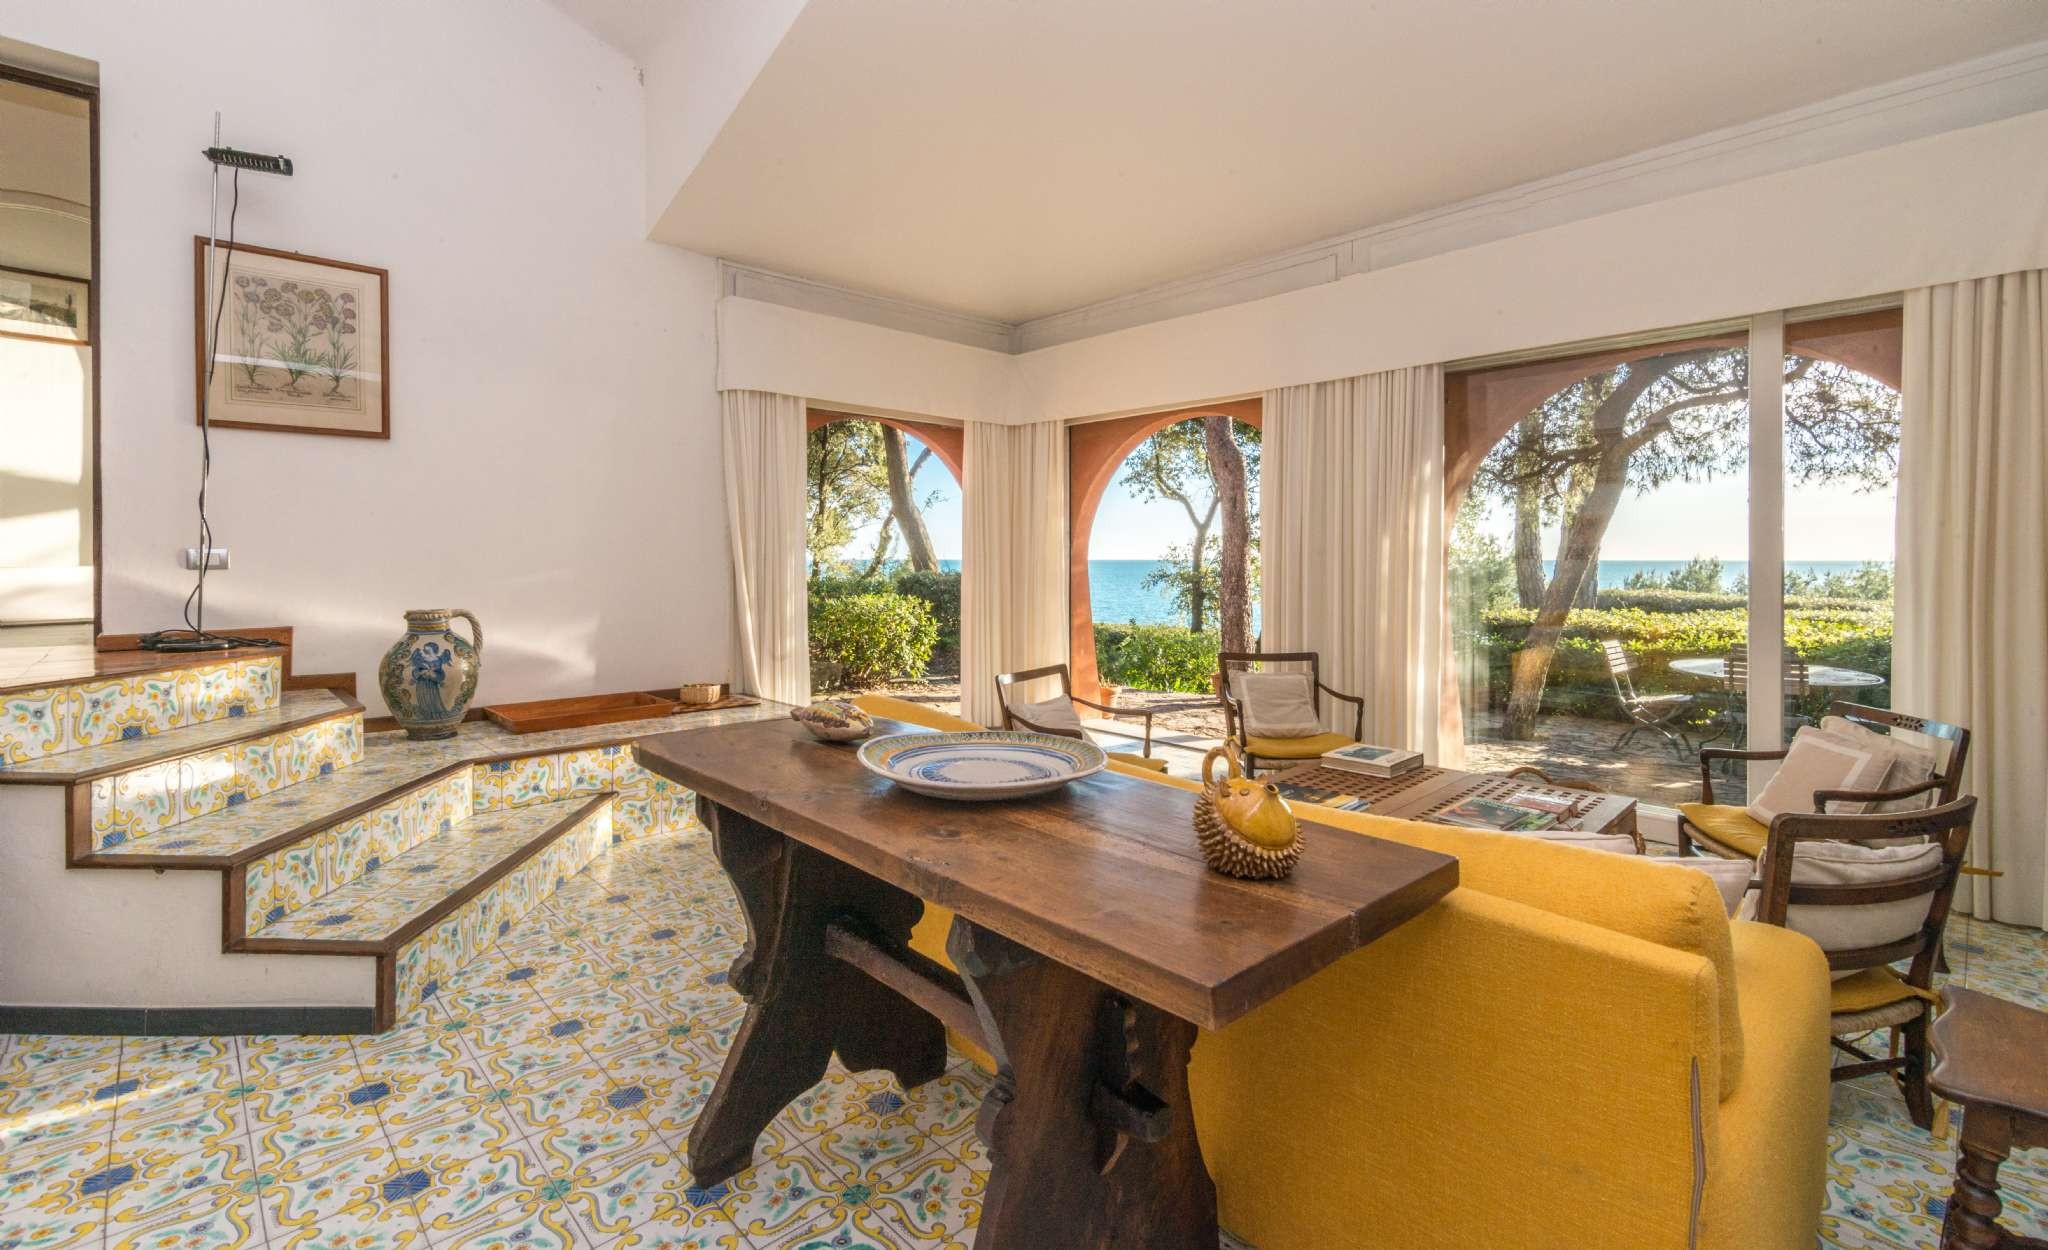 Villa in Vendita a Lerici: 5 locali, 300 mq - Foto 8